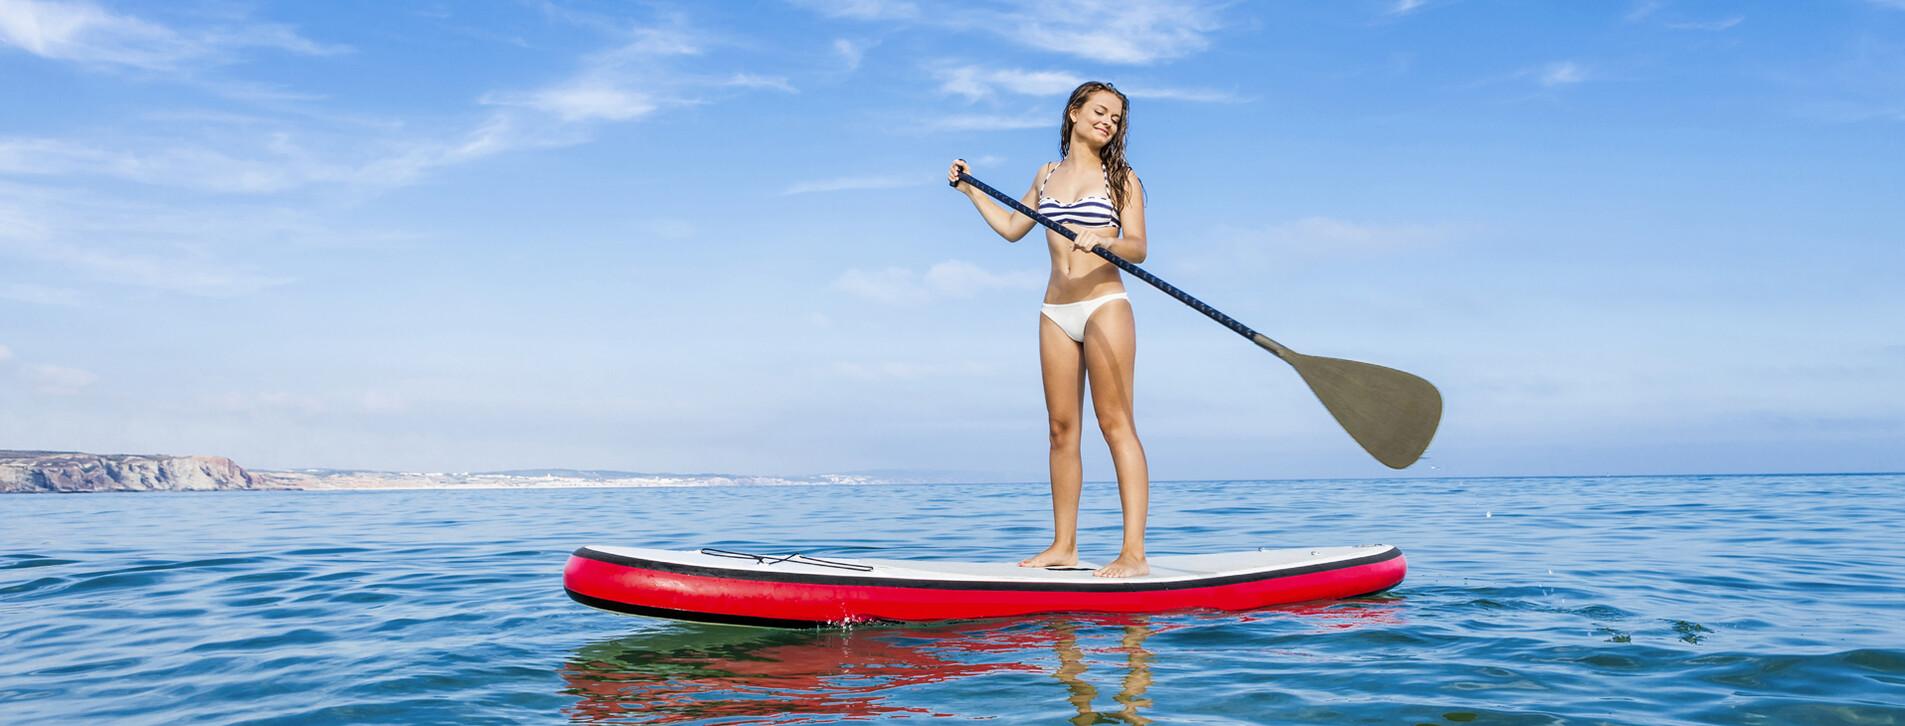 Fotoğraf 1 - Stand Up Paddle Kiralama